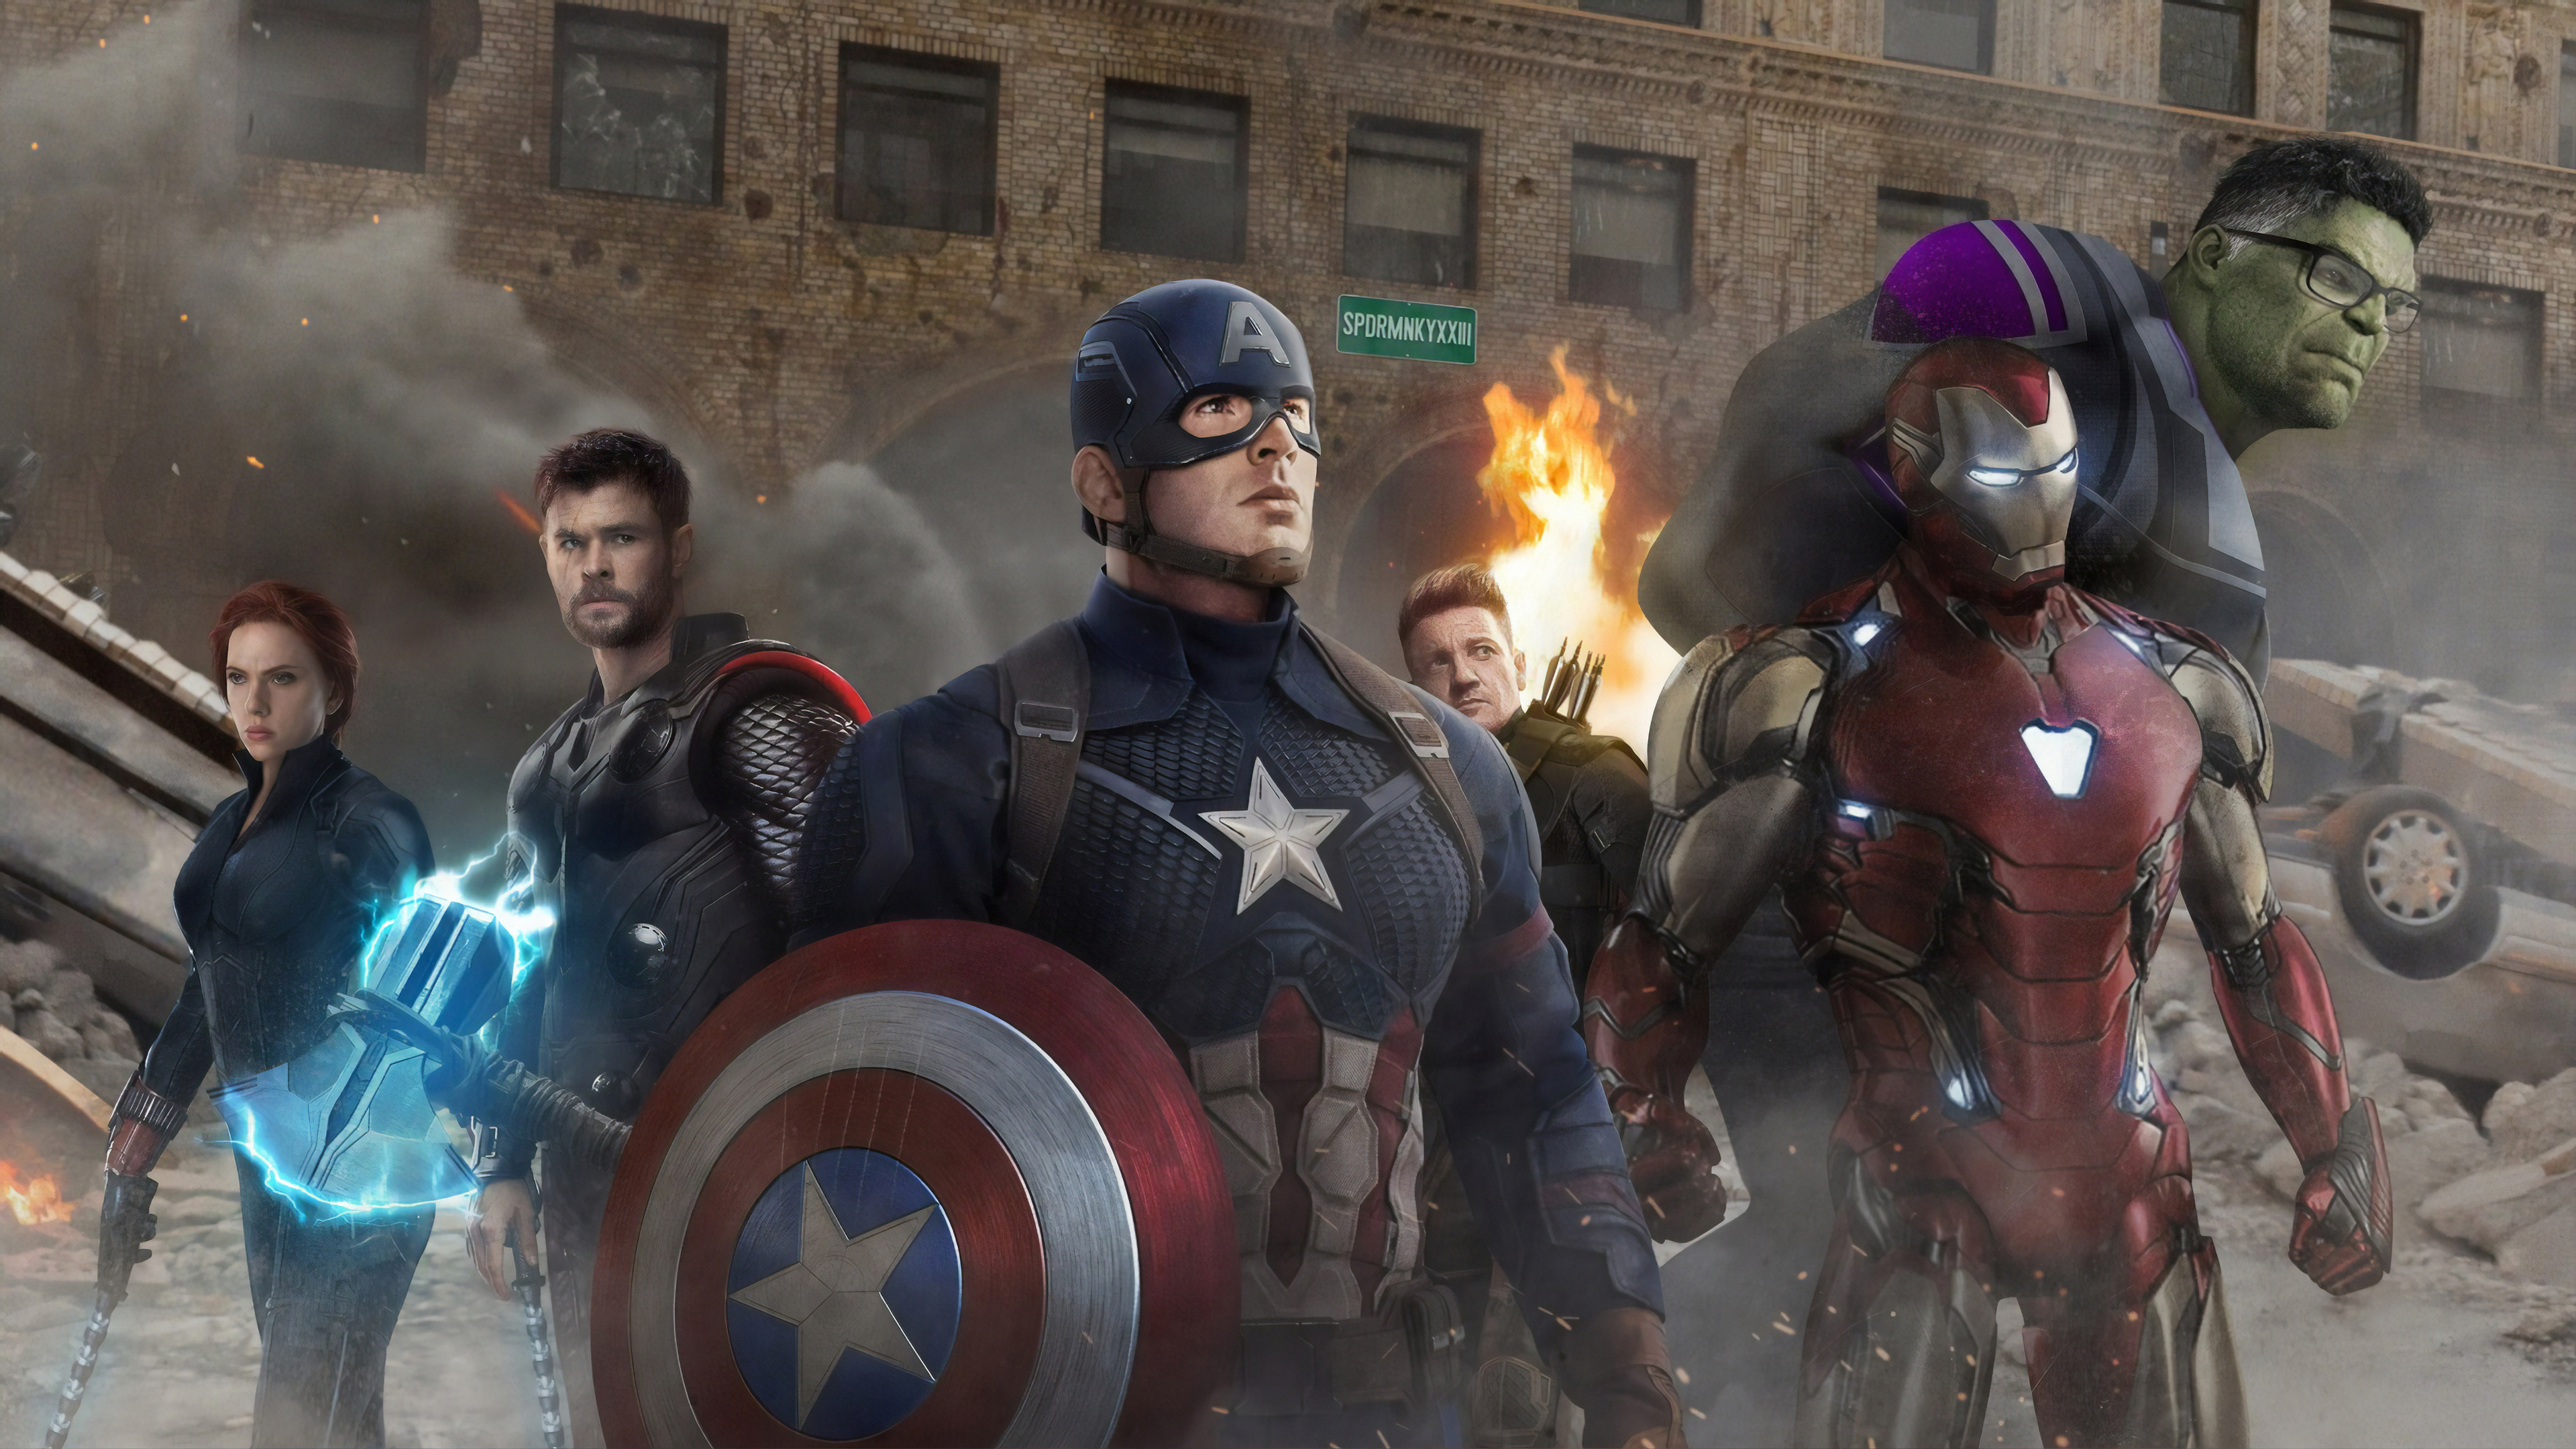 avengers endgame team 1570394435 - Avengers Endgame Team - superheroes wallpapers, hd-wallpapers, avengers endgame wallpapers, artwork wallpapers, 4k-wallpapers